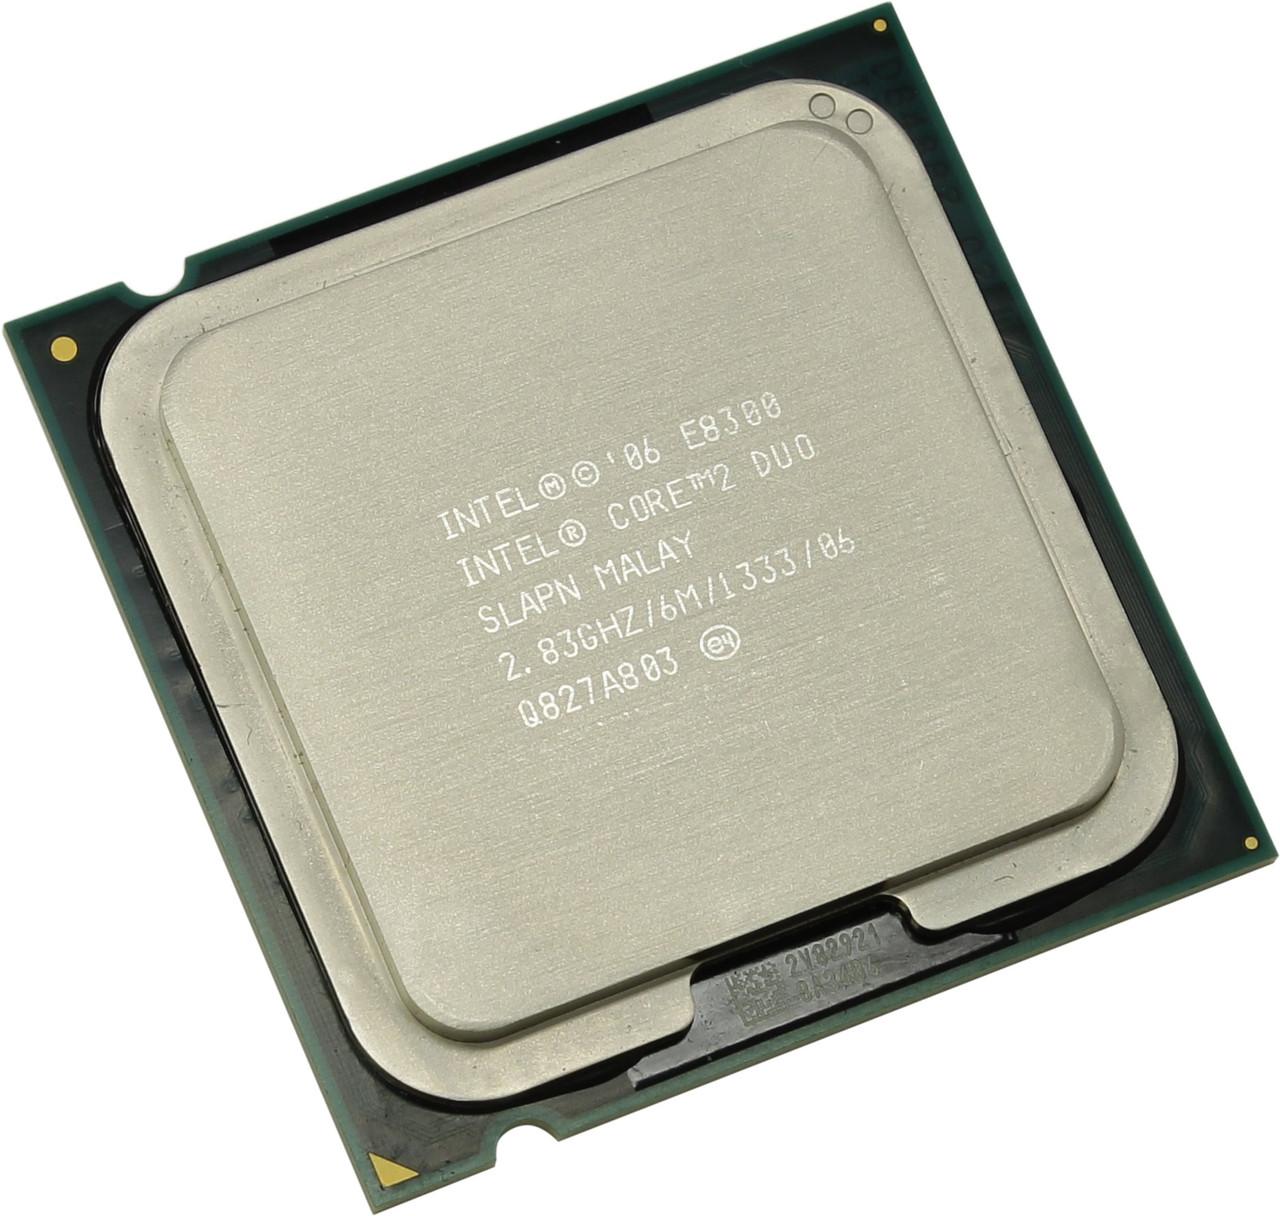 Процессор E8300 Intel Core 2 Duo  2,86 GHZ/6M/1333 + термопаста в ПОДАРОК